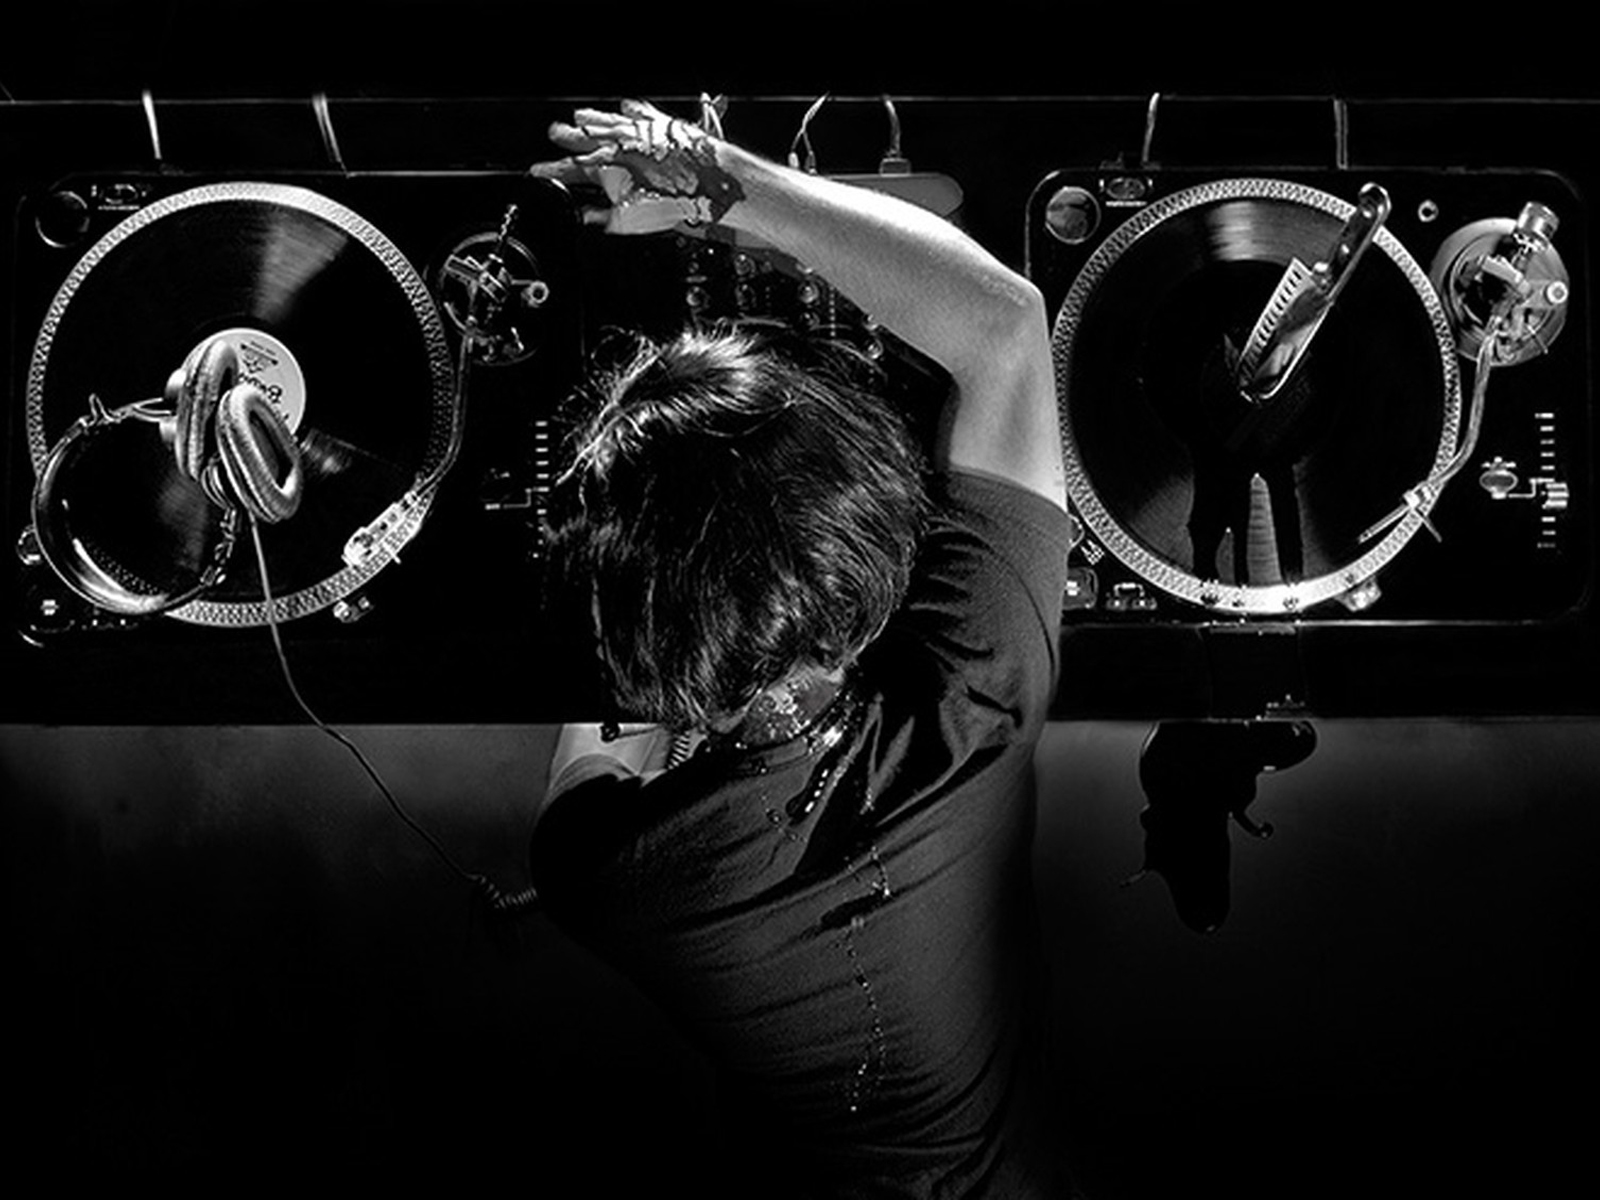 Techmusic-pump: Electronic Music Wallpapers 2